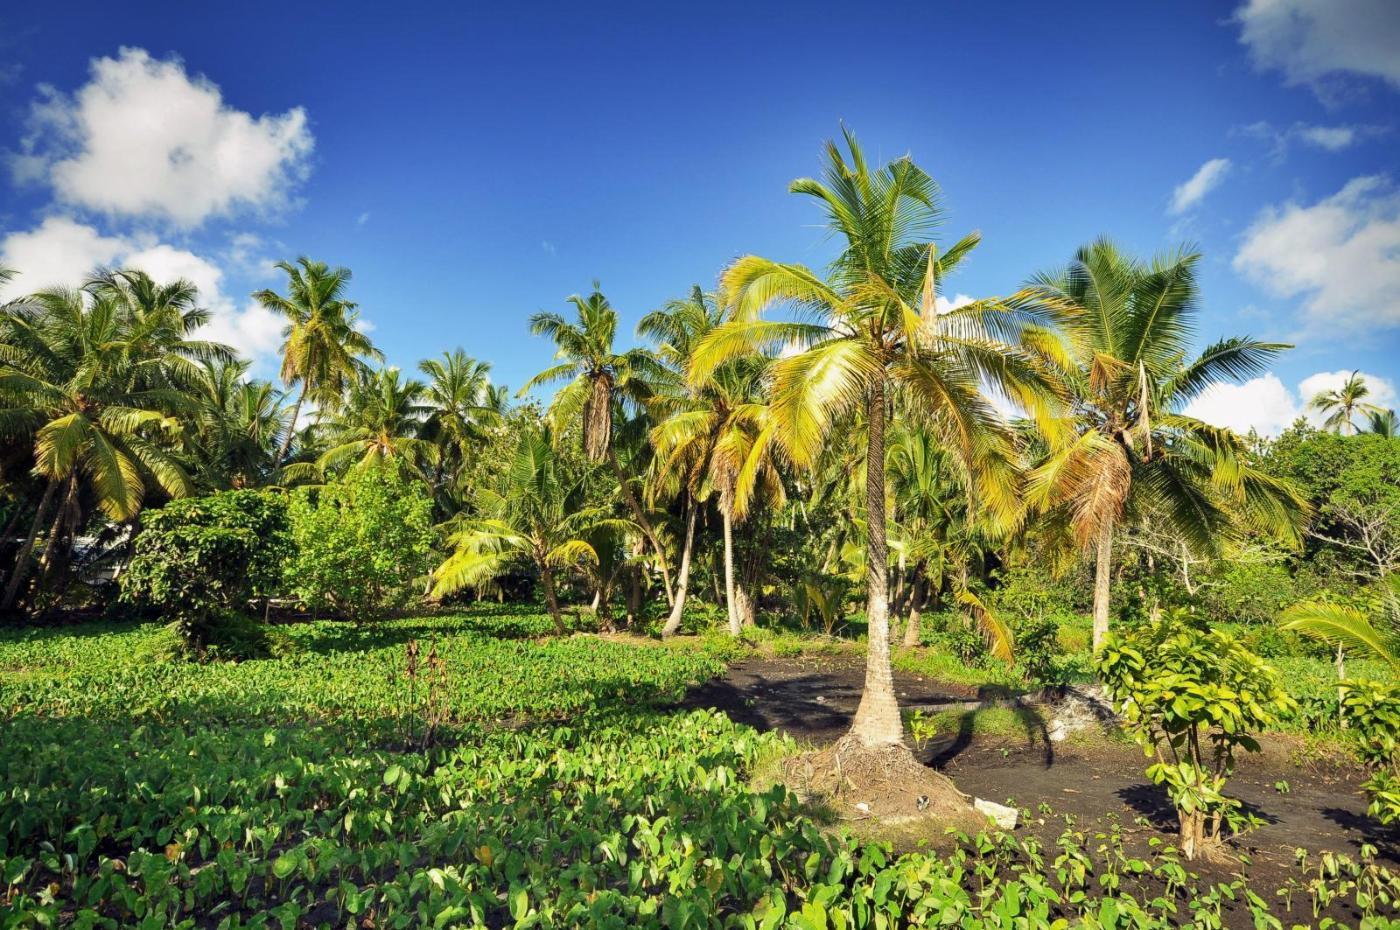 Palm trees. Photo credit: Ibrahim Asad pexels.com